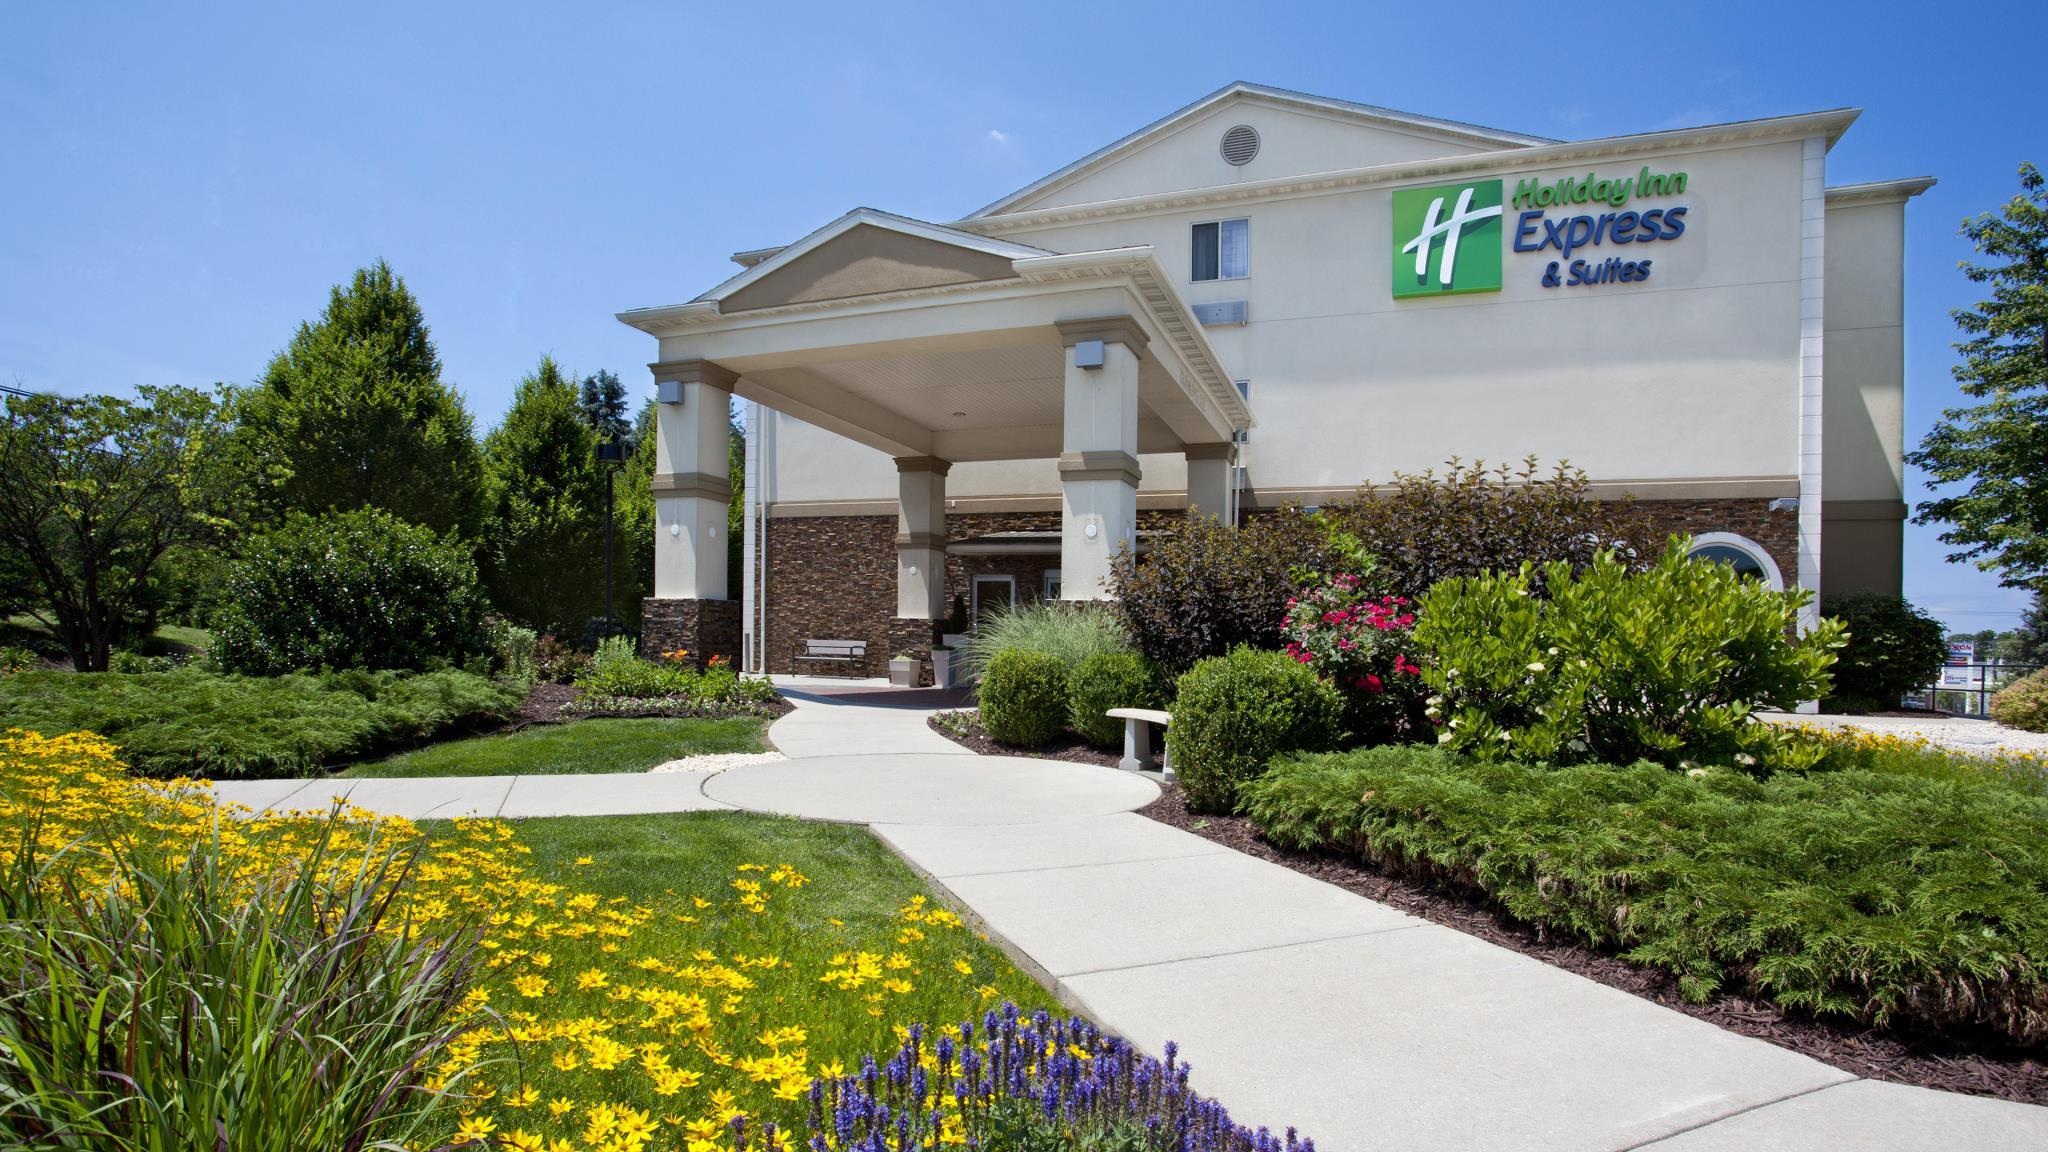 Hotels Allentown Love In